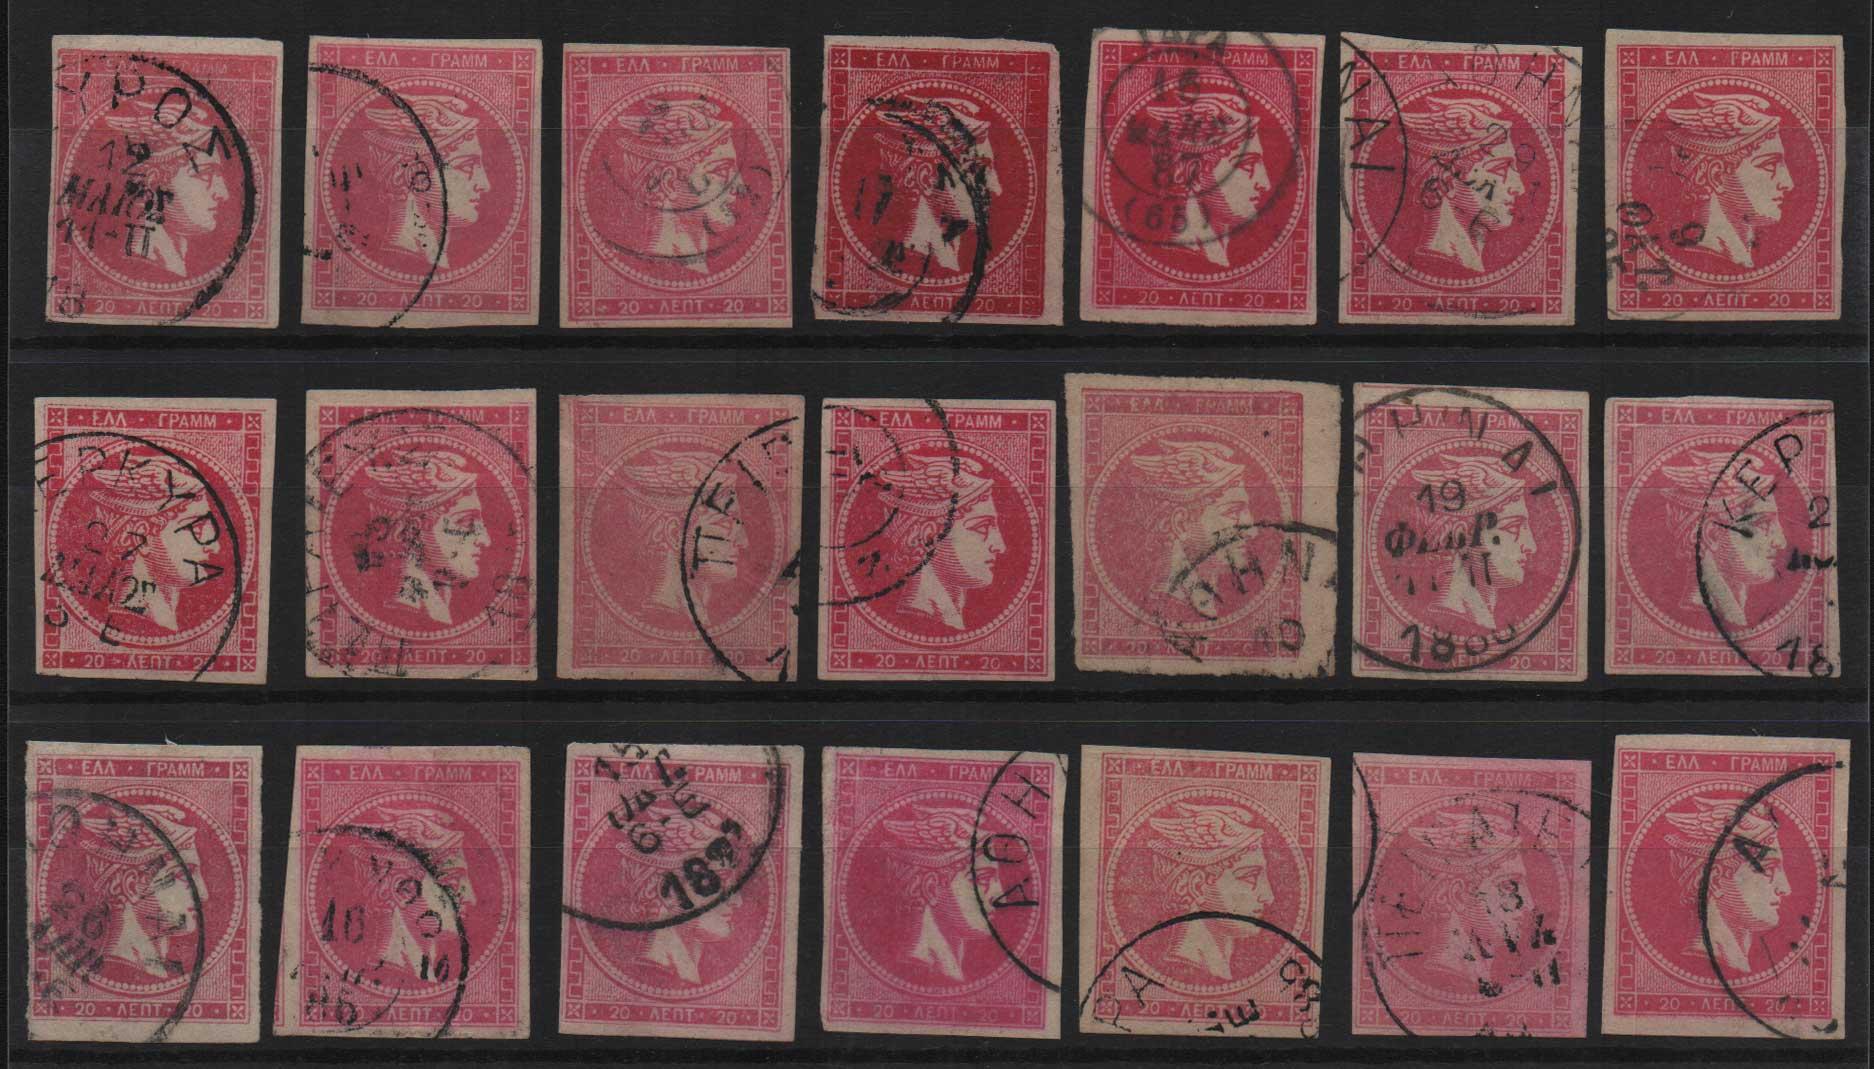 Lot 20 - -  LARGE HERMES HEAD large hermes head -  Athens Auctions Public Auction 72 General Stamp Sale